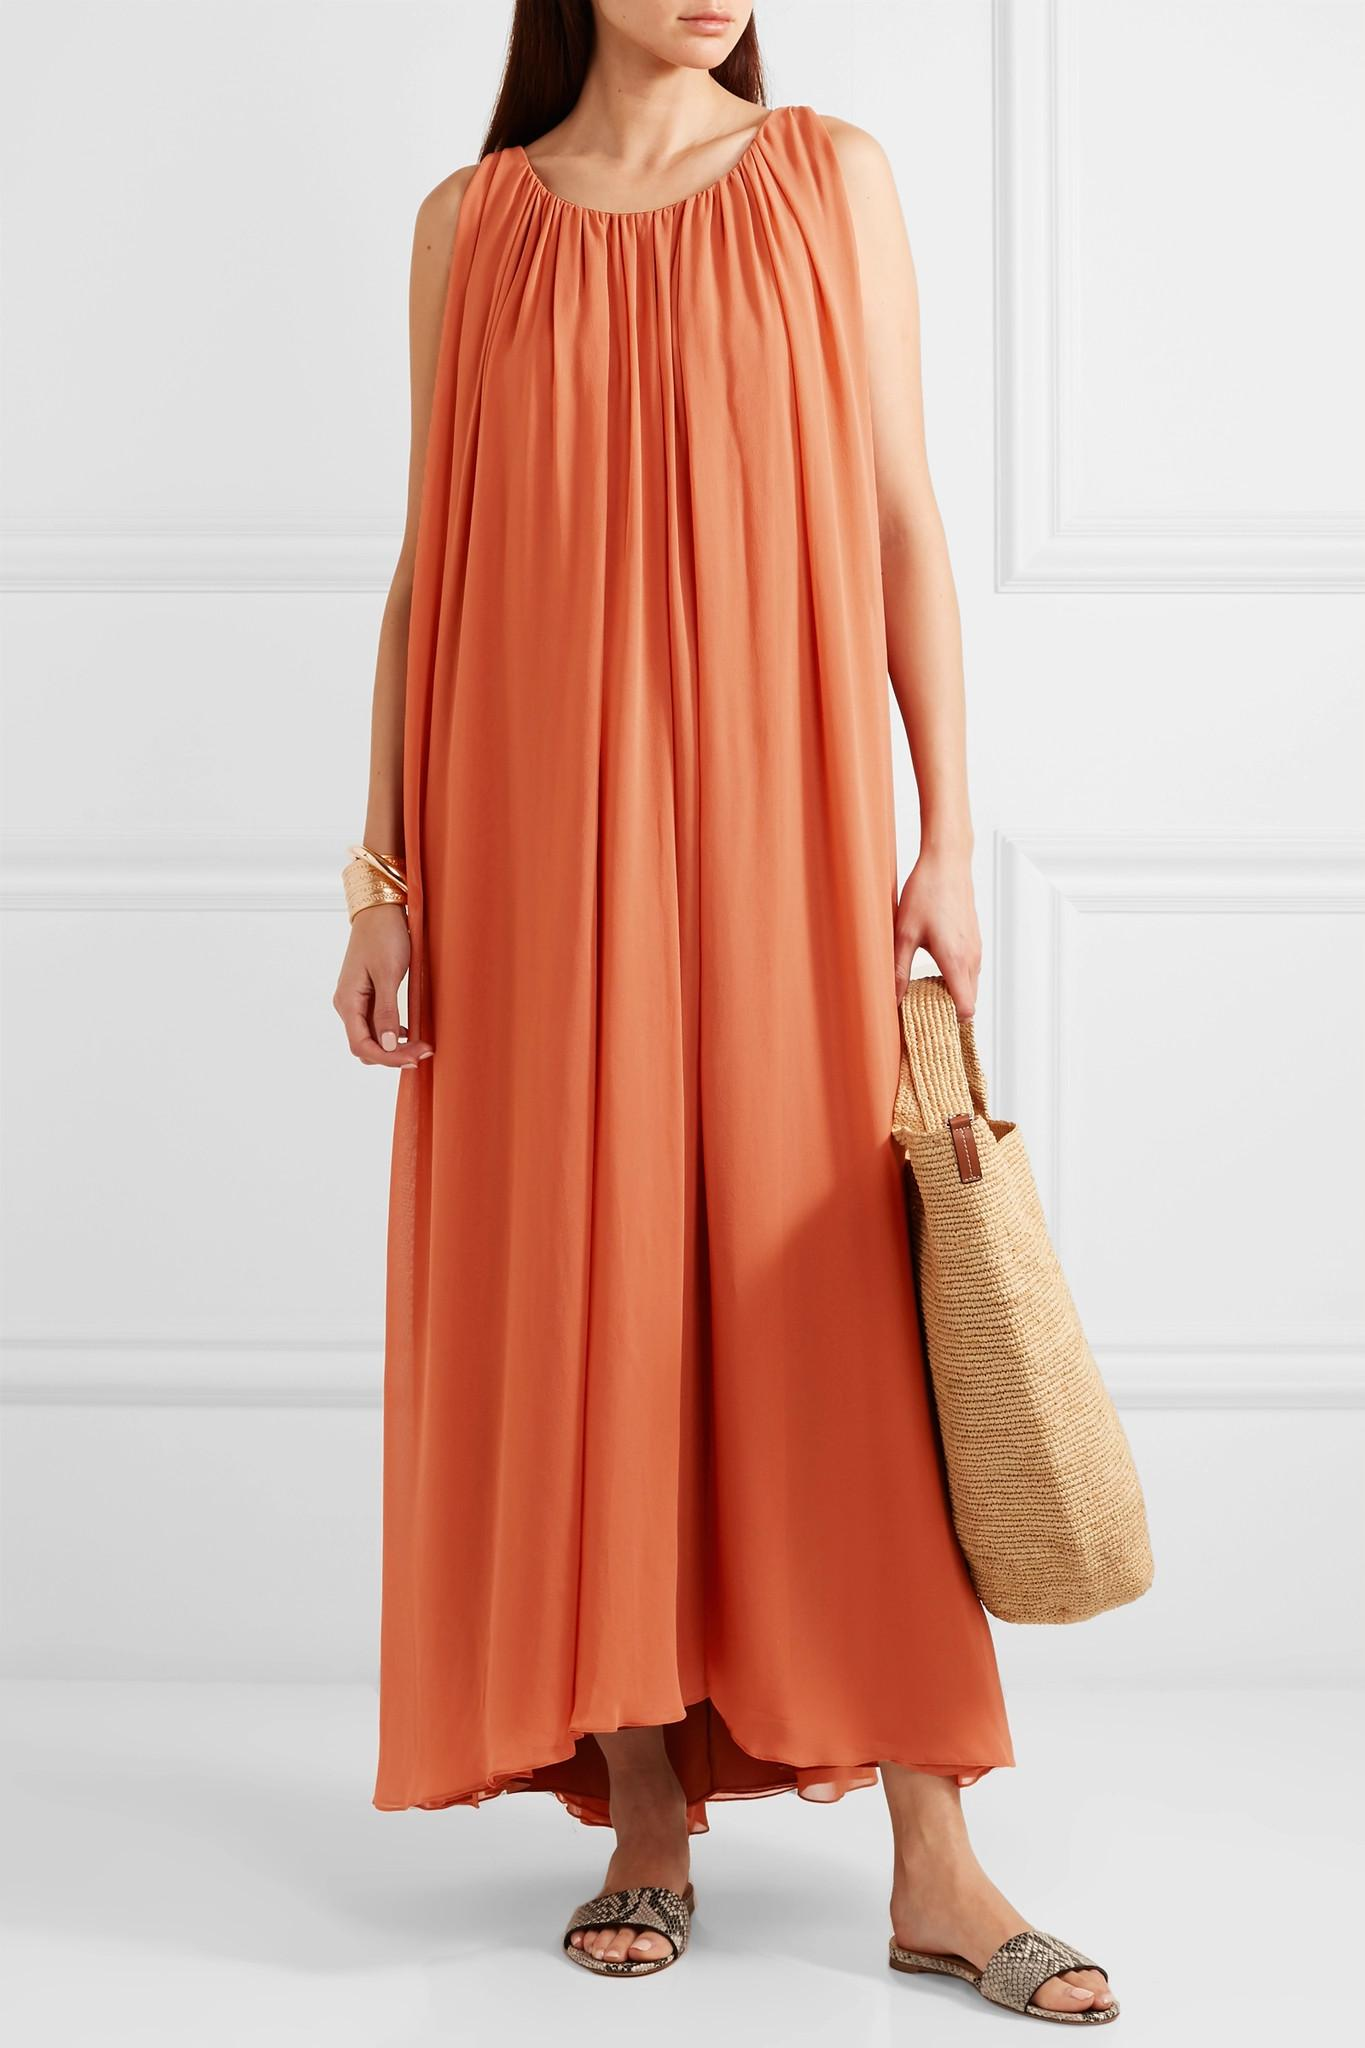 Satin Pleated Wrap Maxi Dress in Champagne - Lavish Alice USA